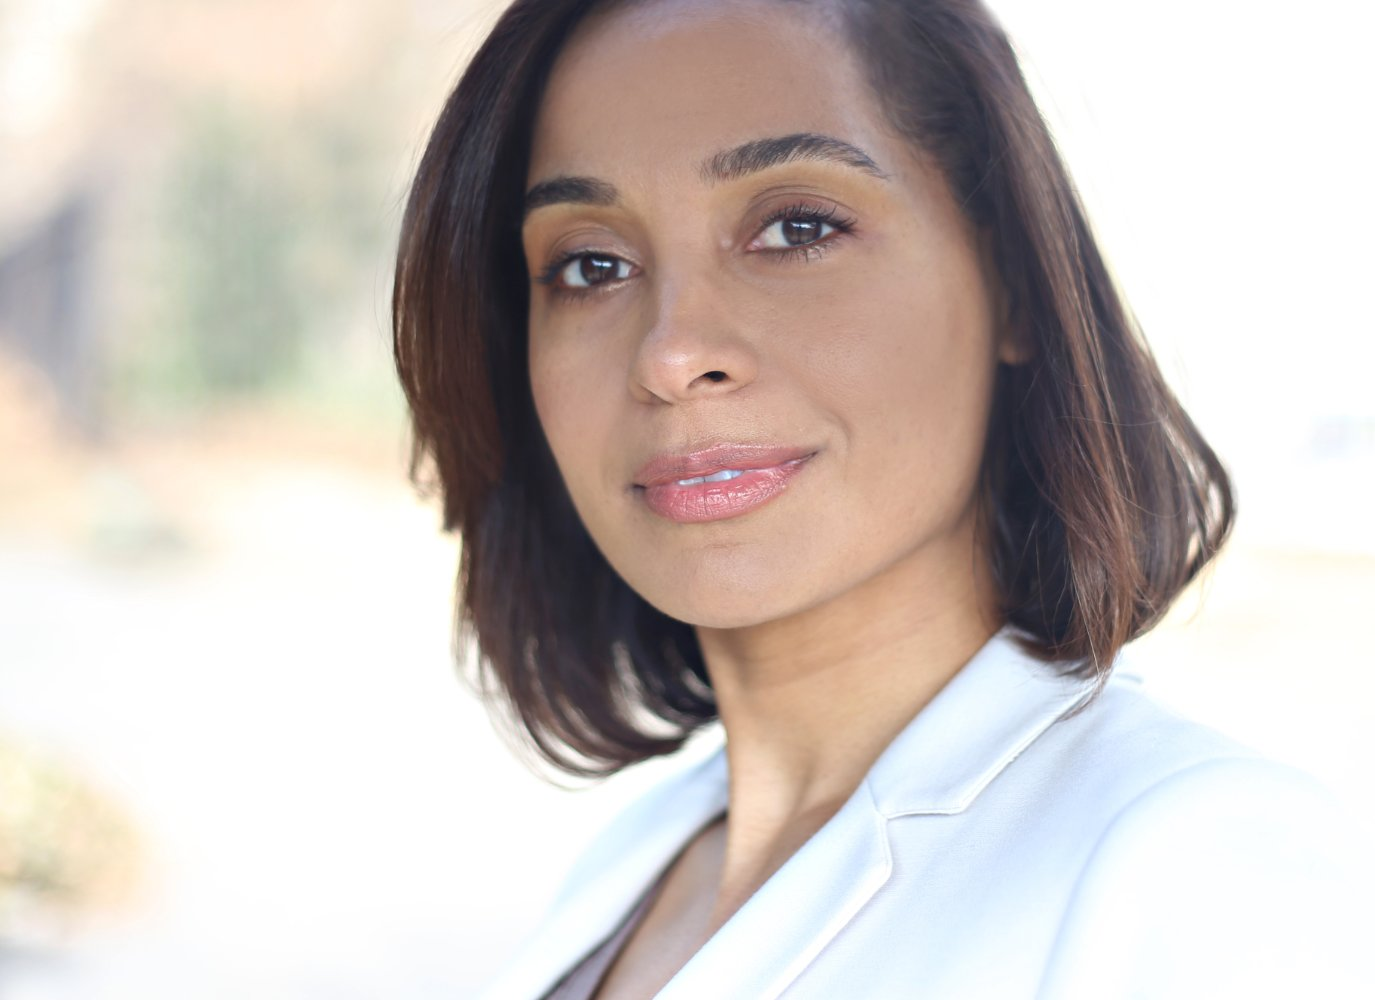 Lisa Ferreira